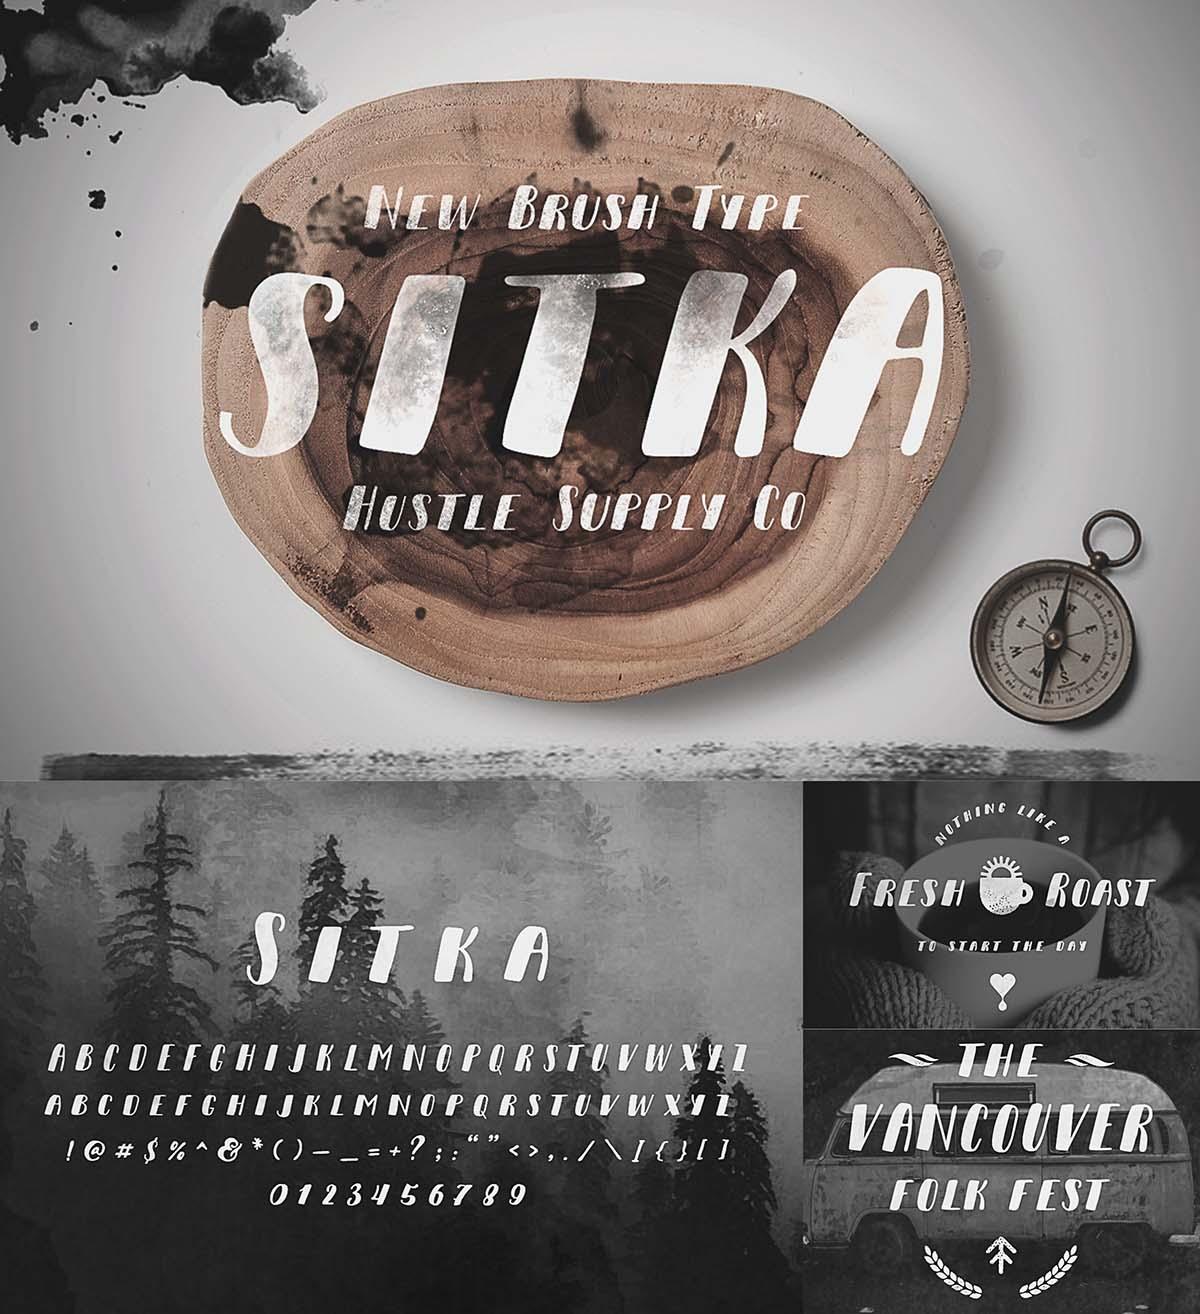 Sitka brush type